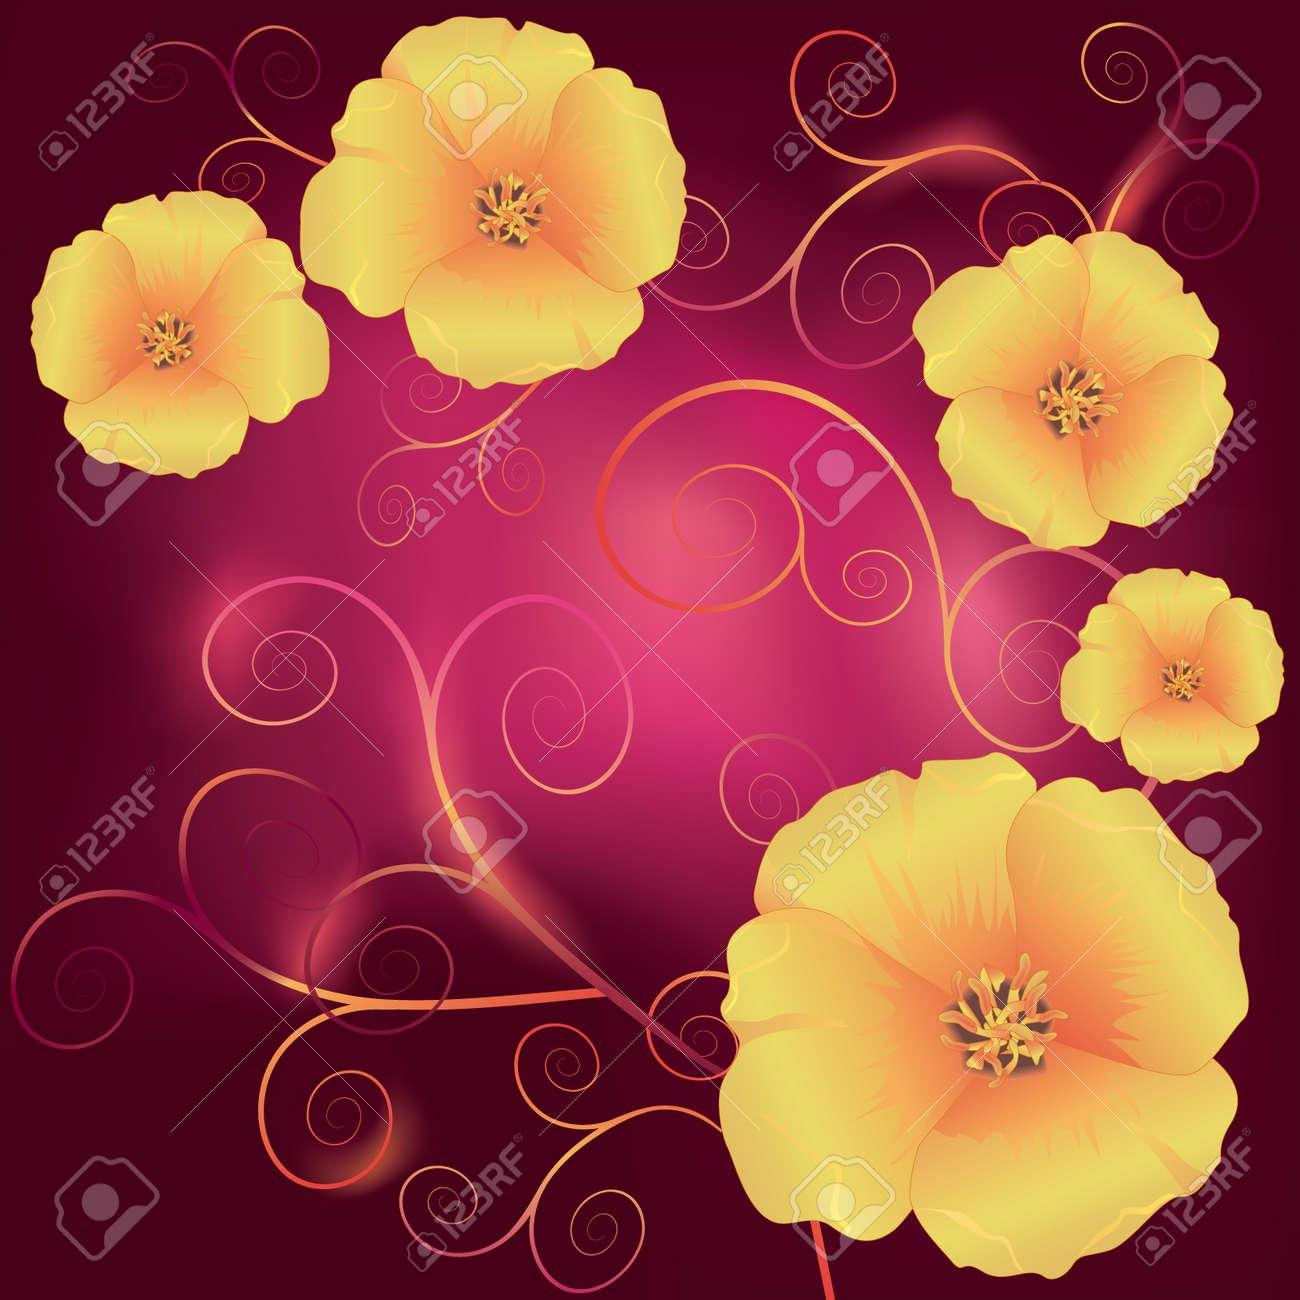 Beautiful california golden poppies official state flower of beautiful california golden poppies official state flower of california and decorative swirls on a dark mightylinksfo